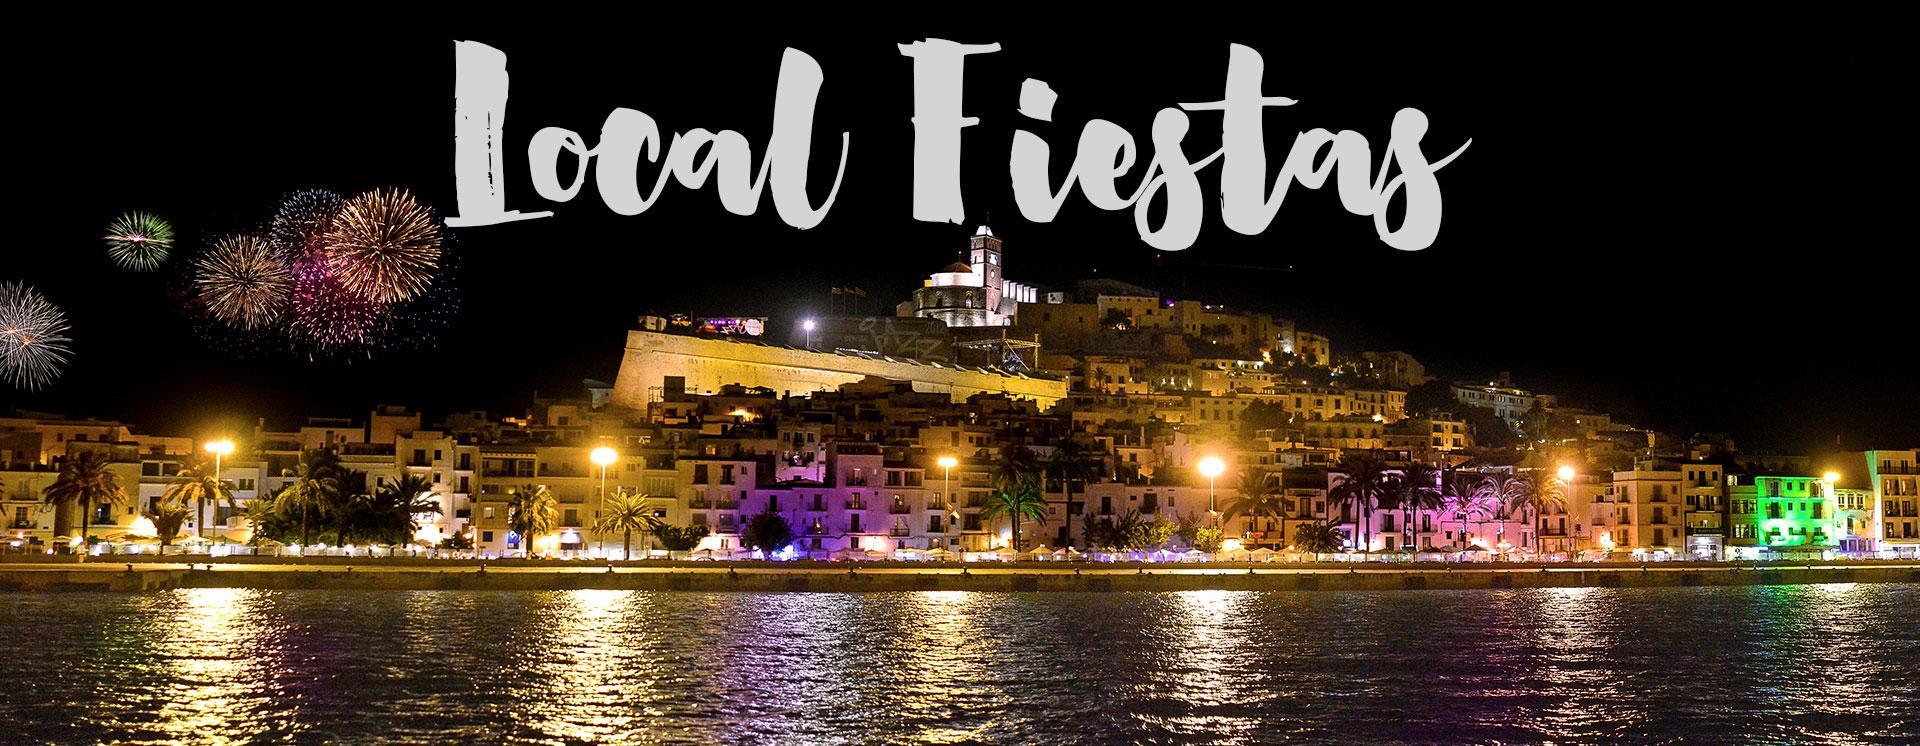 Local Fiestas